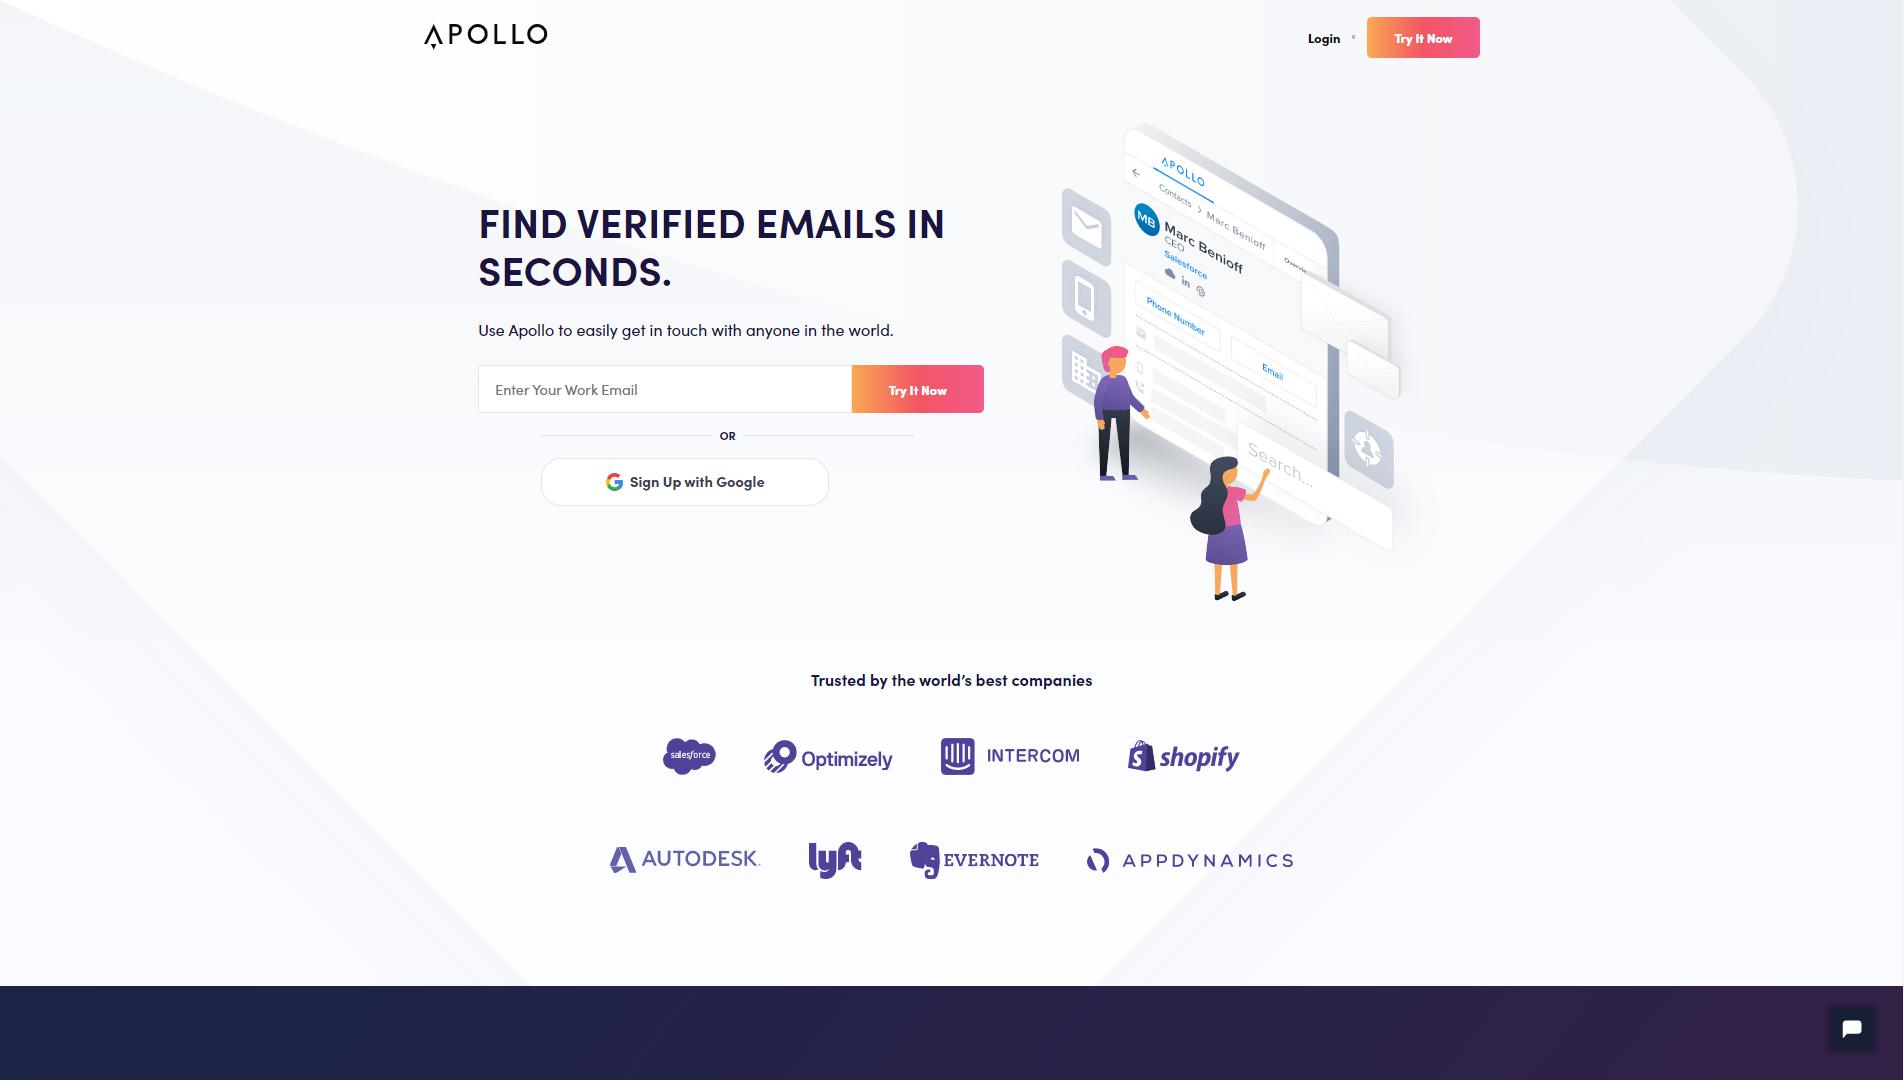 Apollo Landing Page